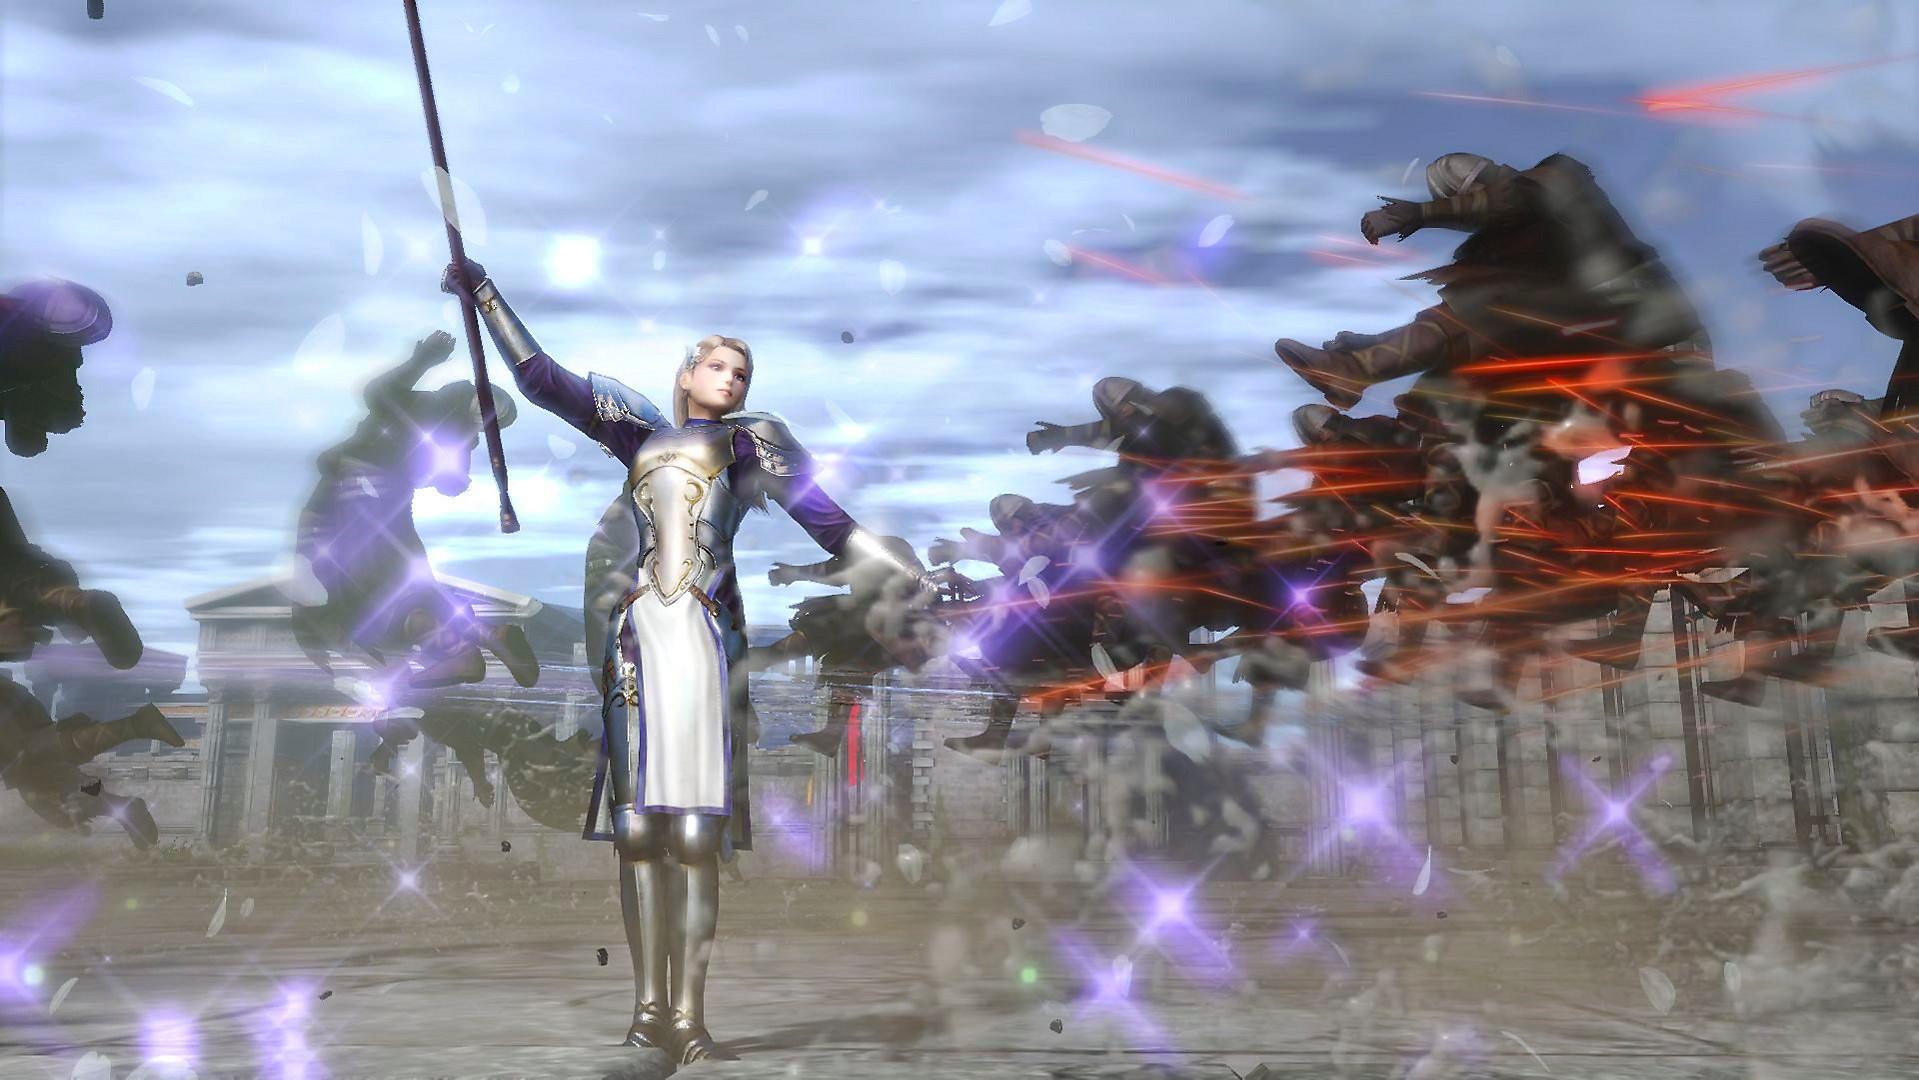 warriors-orochi-4-ultimate-screenshot-02